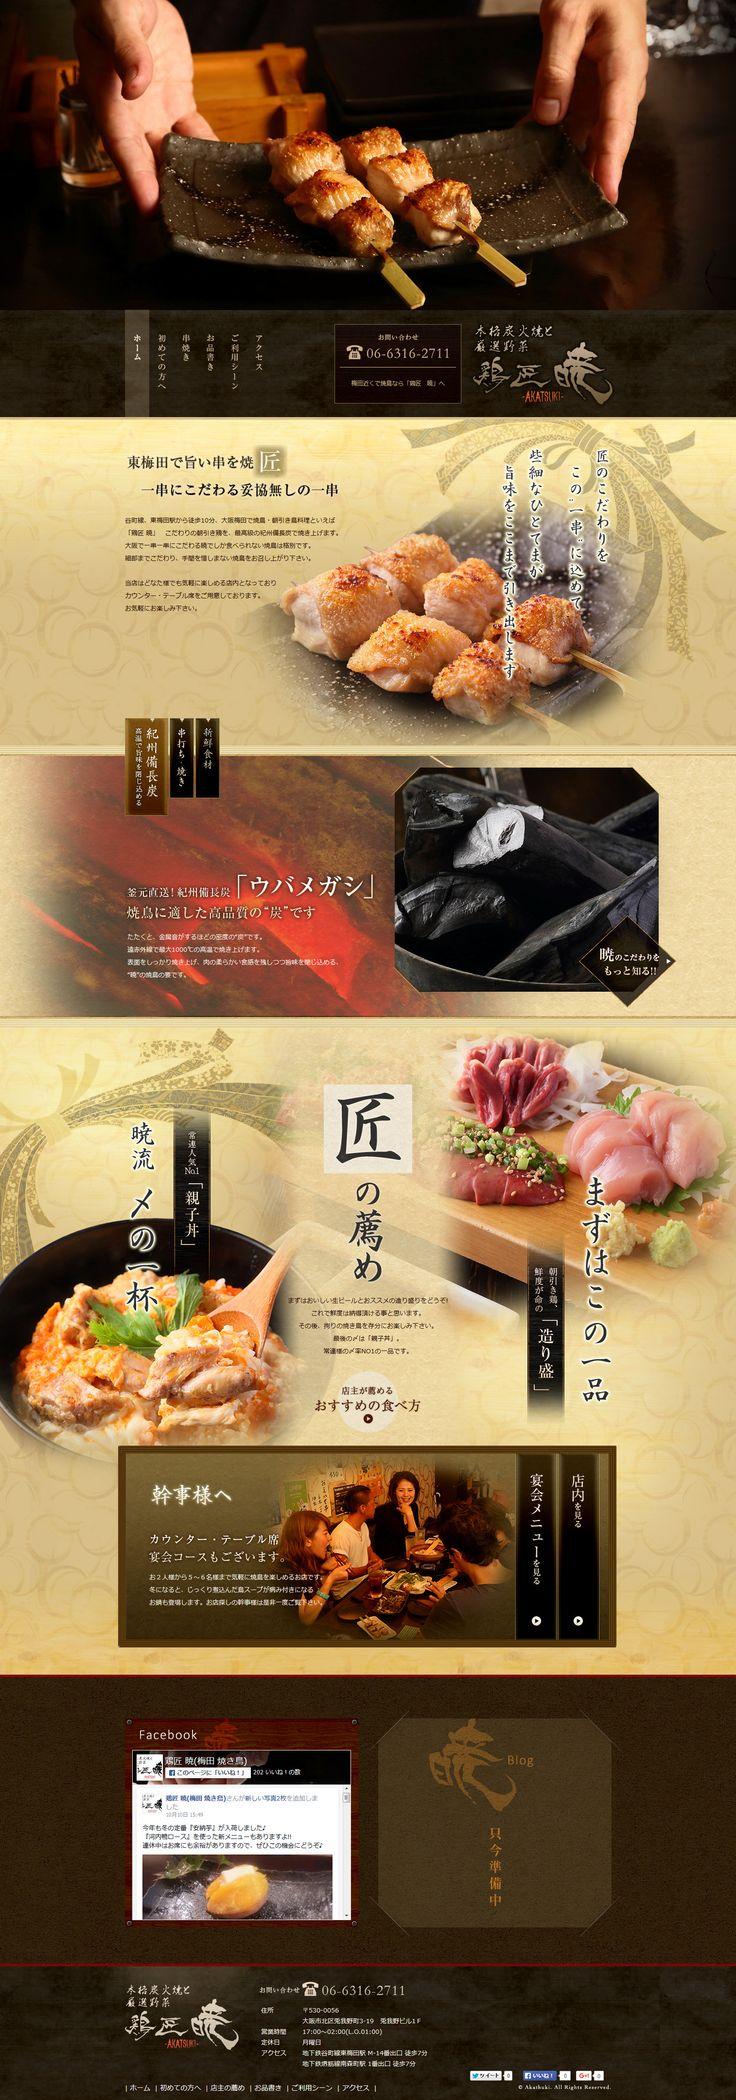 東梅田の焼鳥専門「鶏匠 暁」